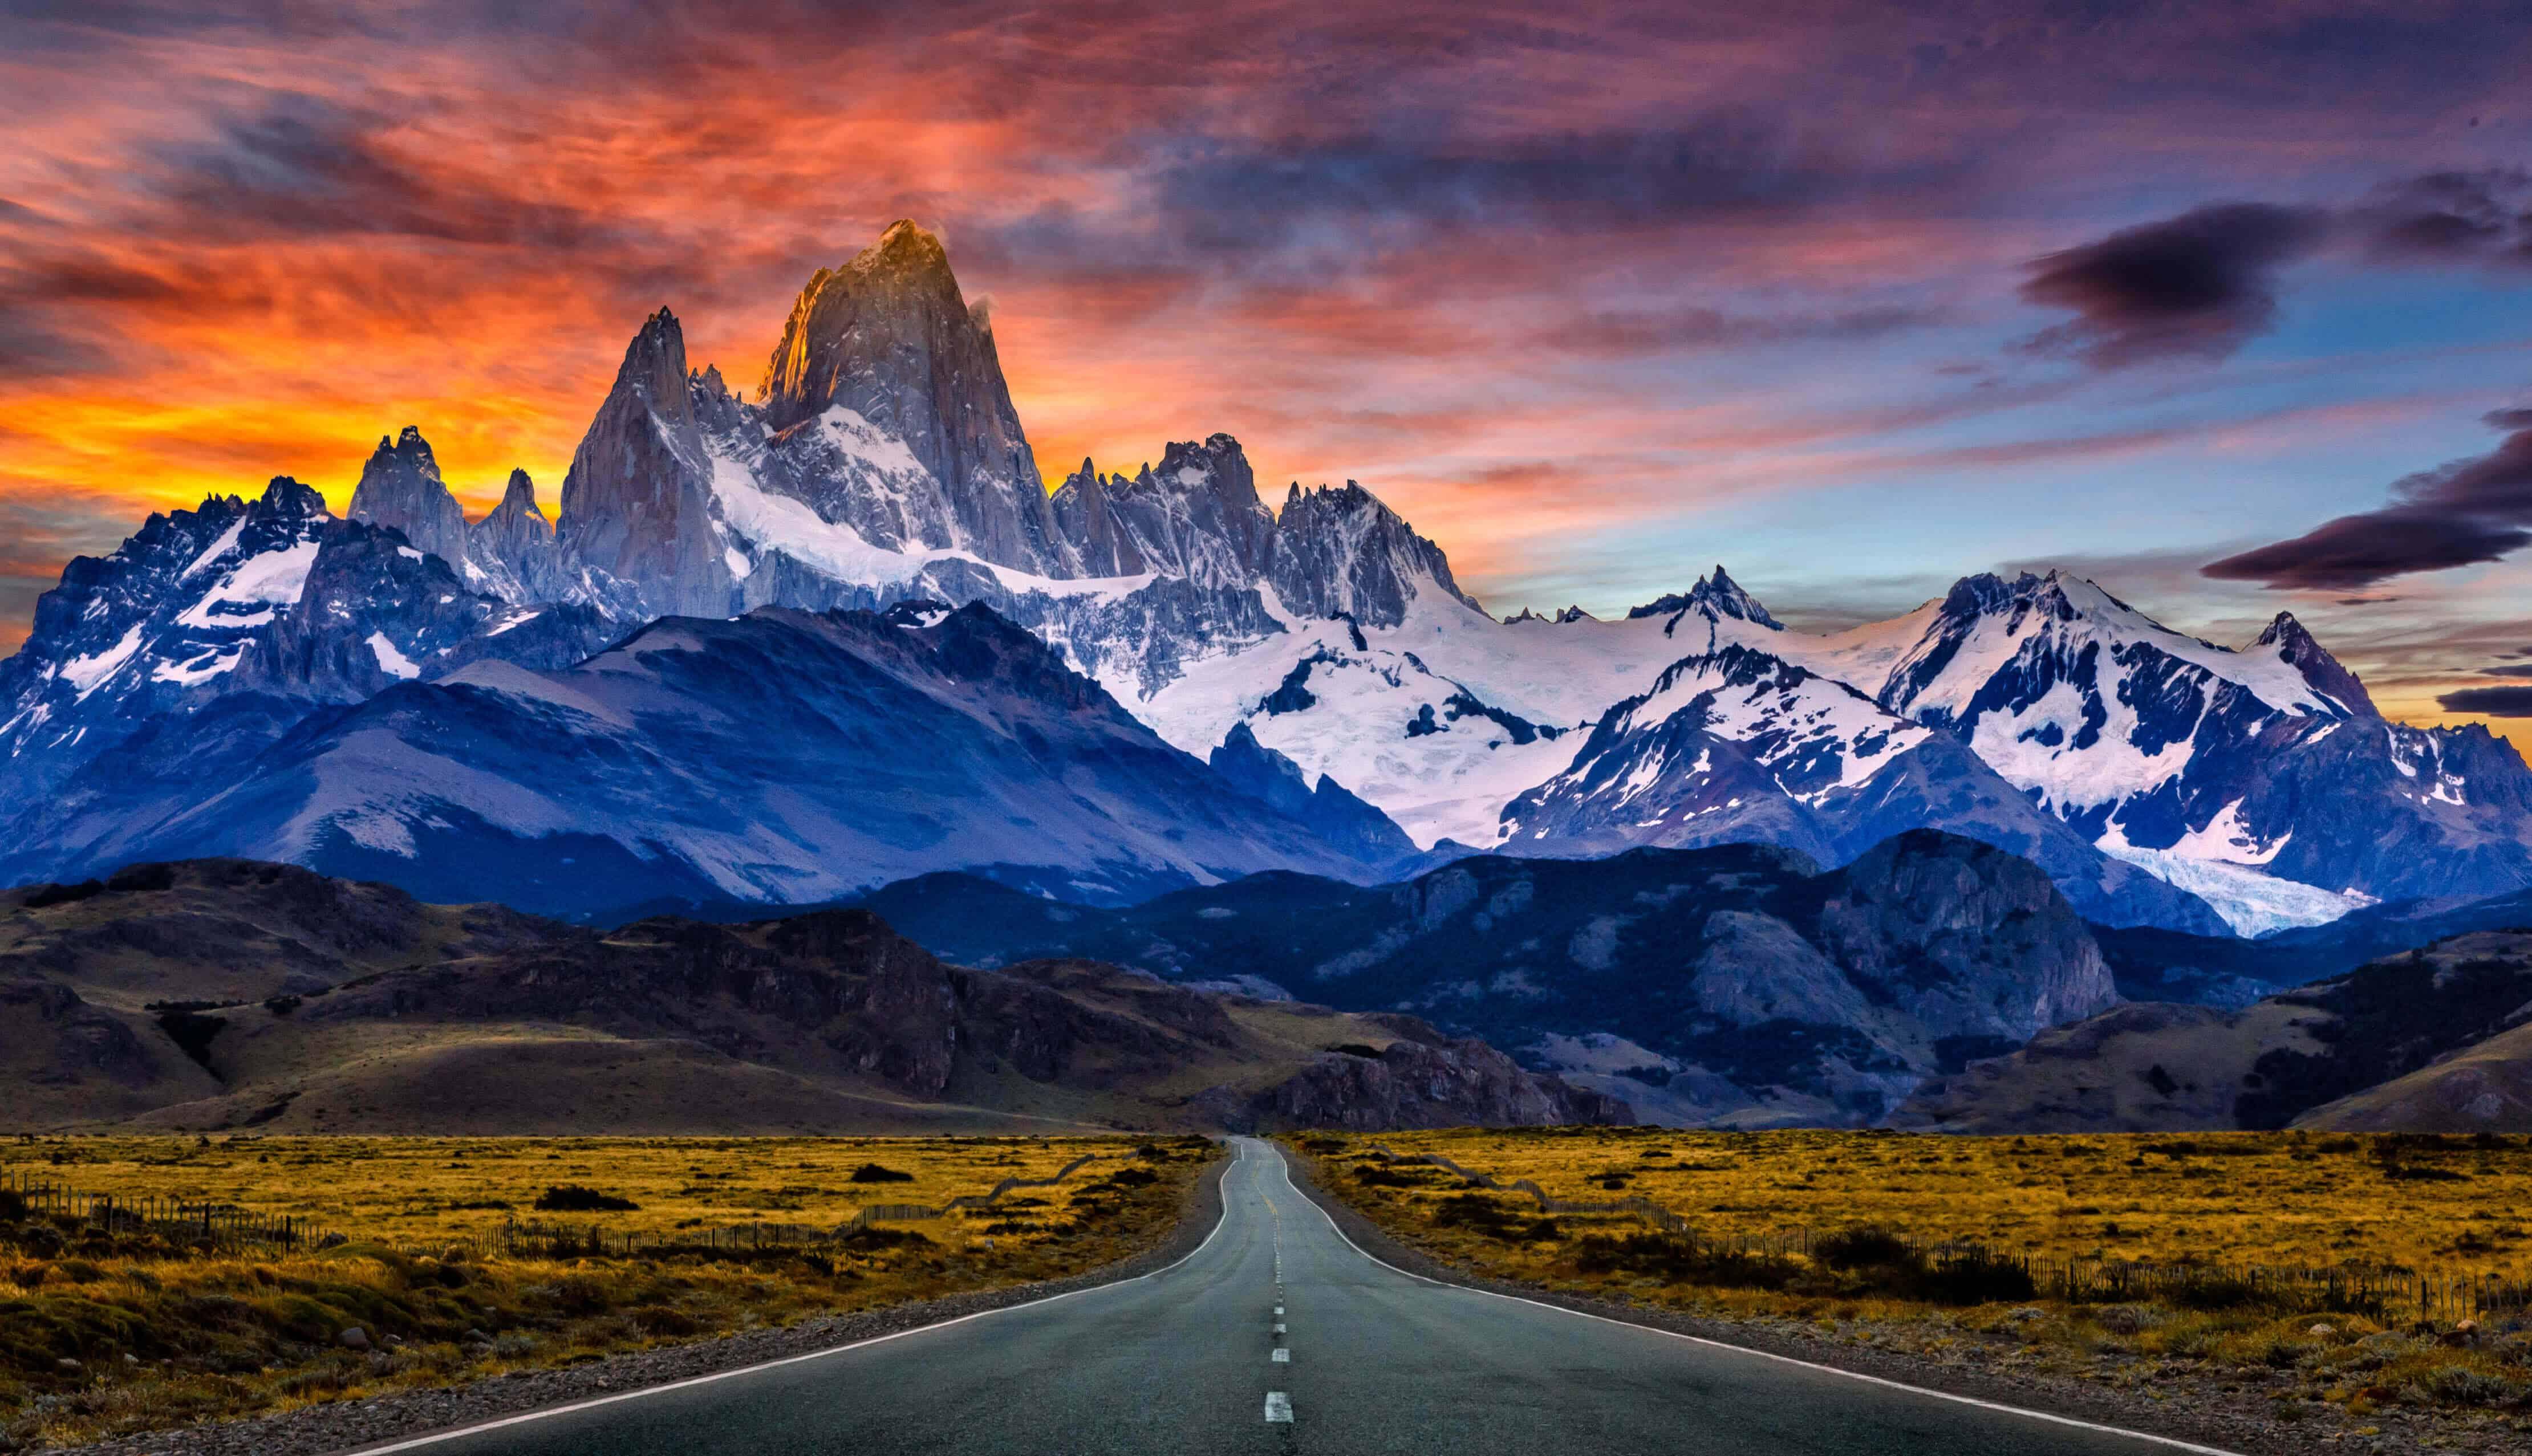 monte fitz roy mountain patagonian ice field patagonia uhd 4k wallpaper